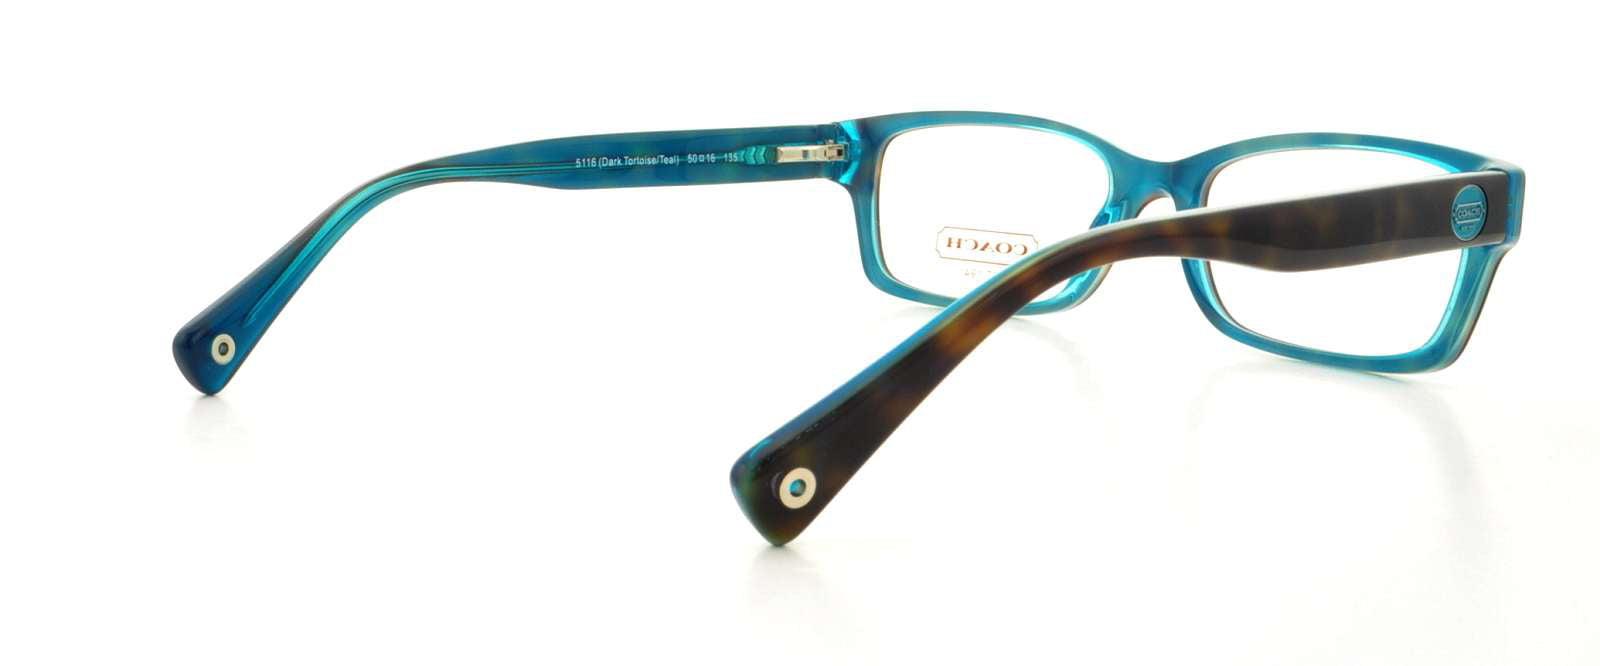 63046efe5beb COACH Eyeglasses HC 6040 5116 Tortoise Teal 52MM - Walmart.com